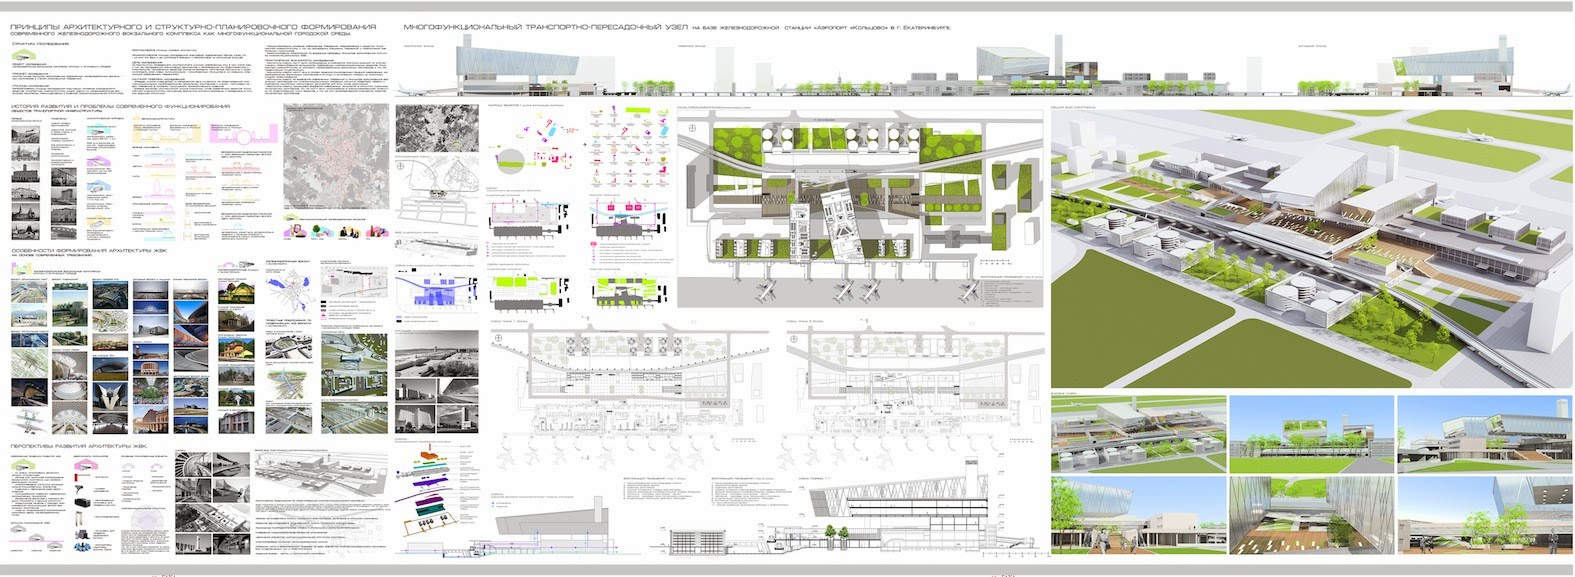 Architecture Dissertation